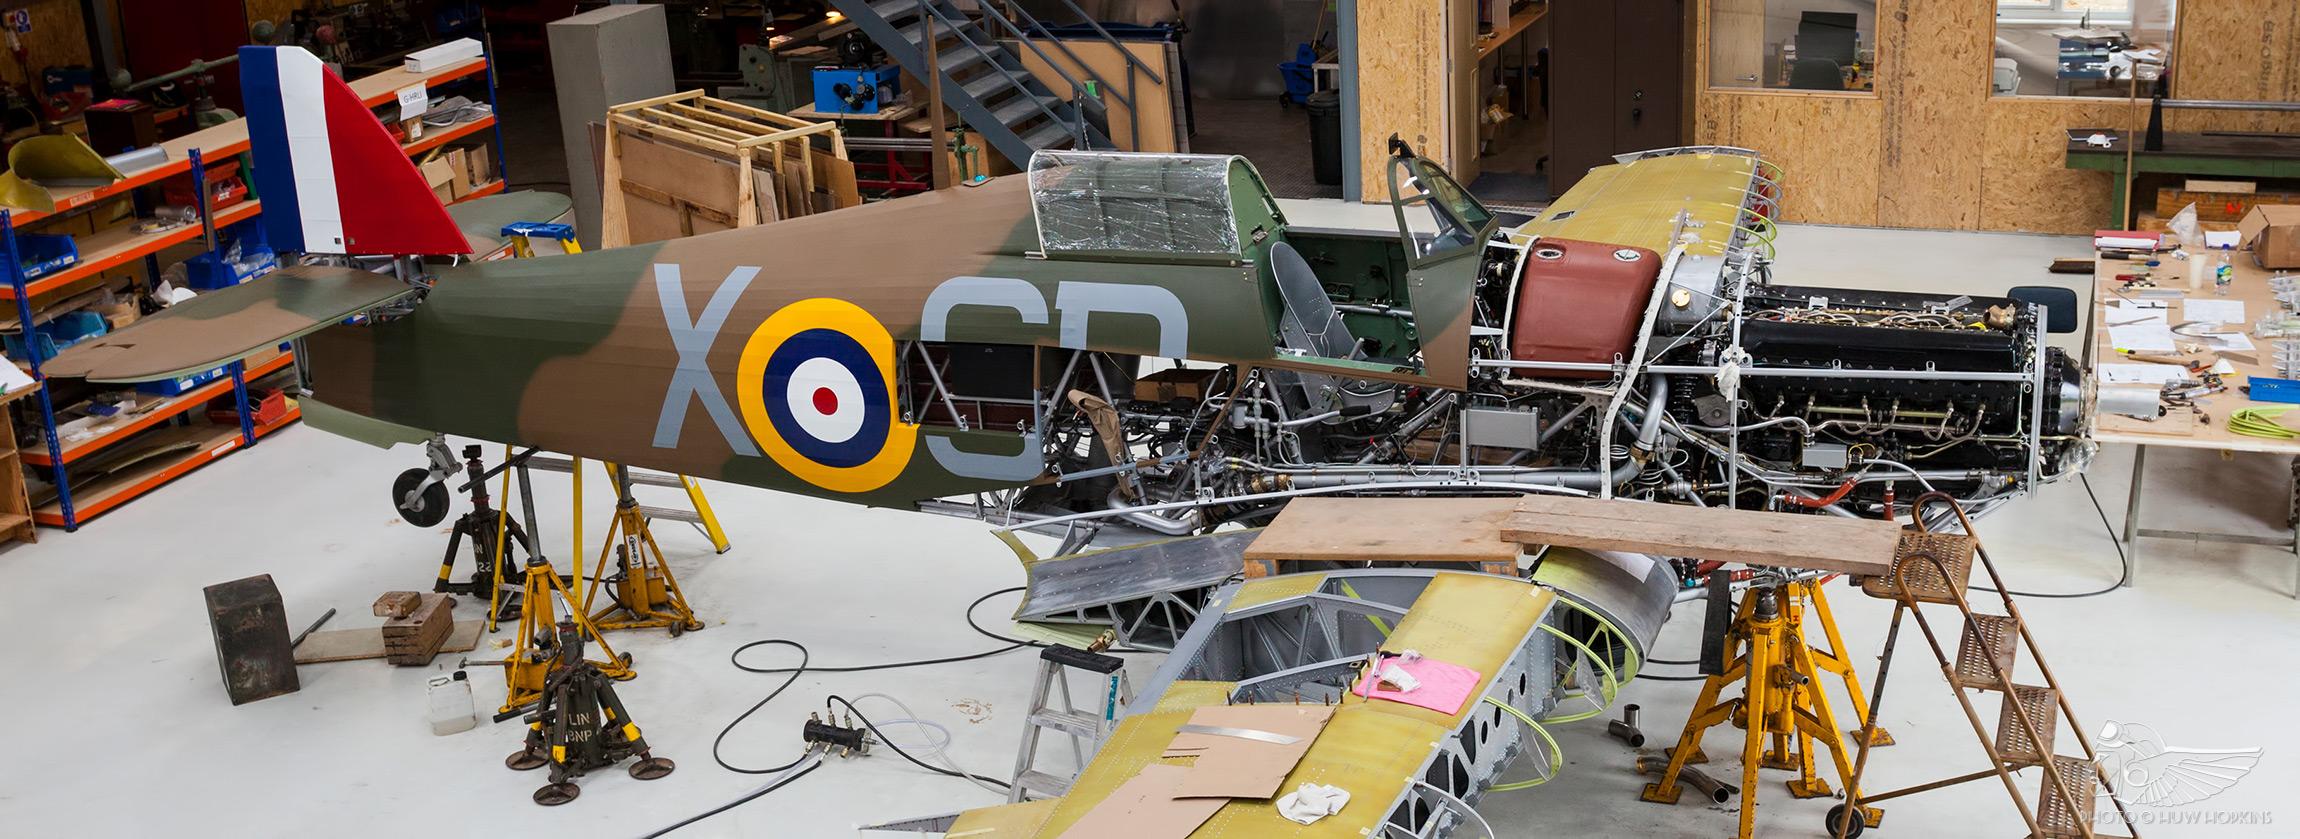 First flight in sight for Battle of Britain veteran Hurricane V7497